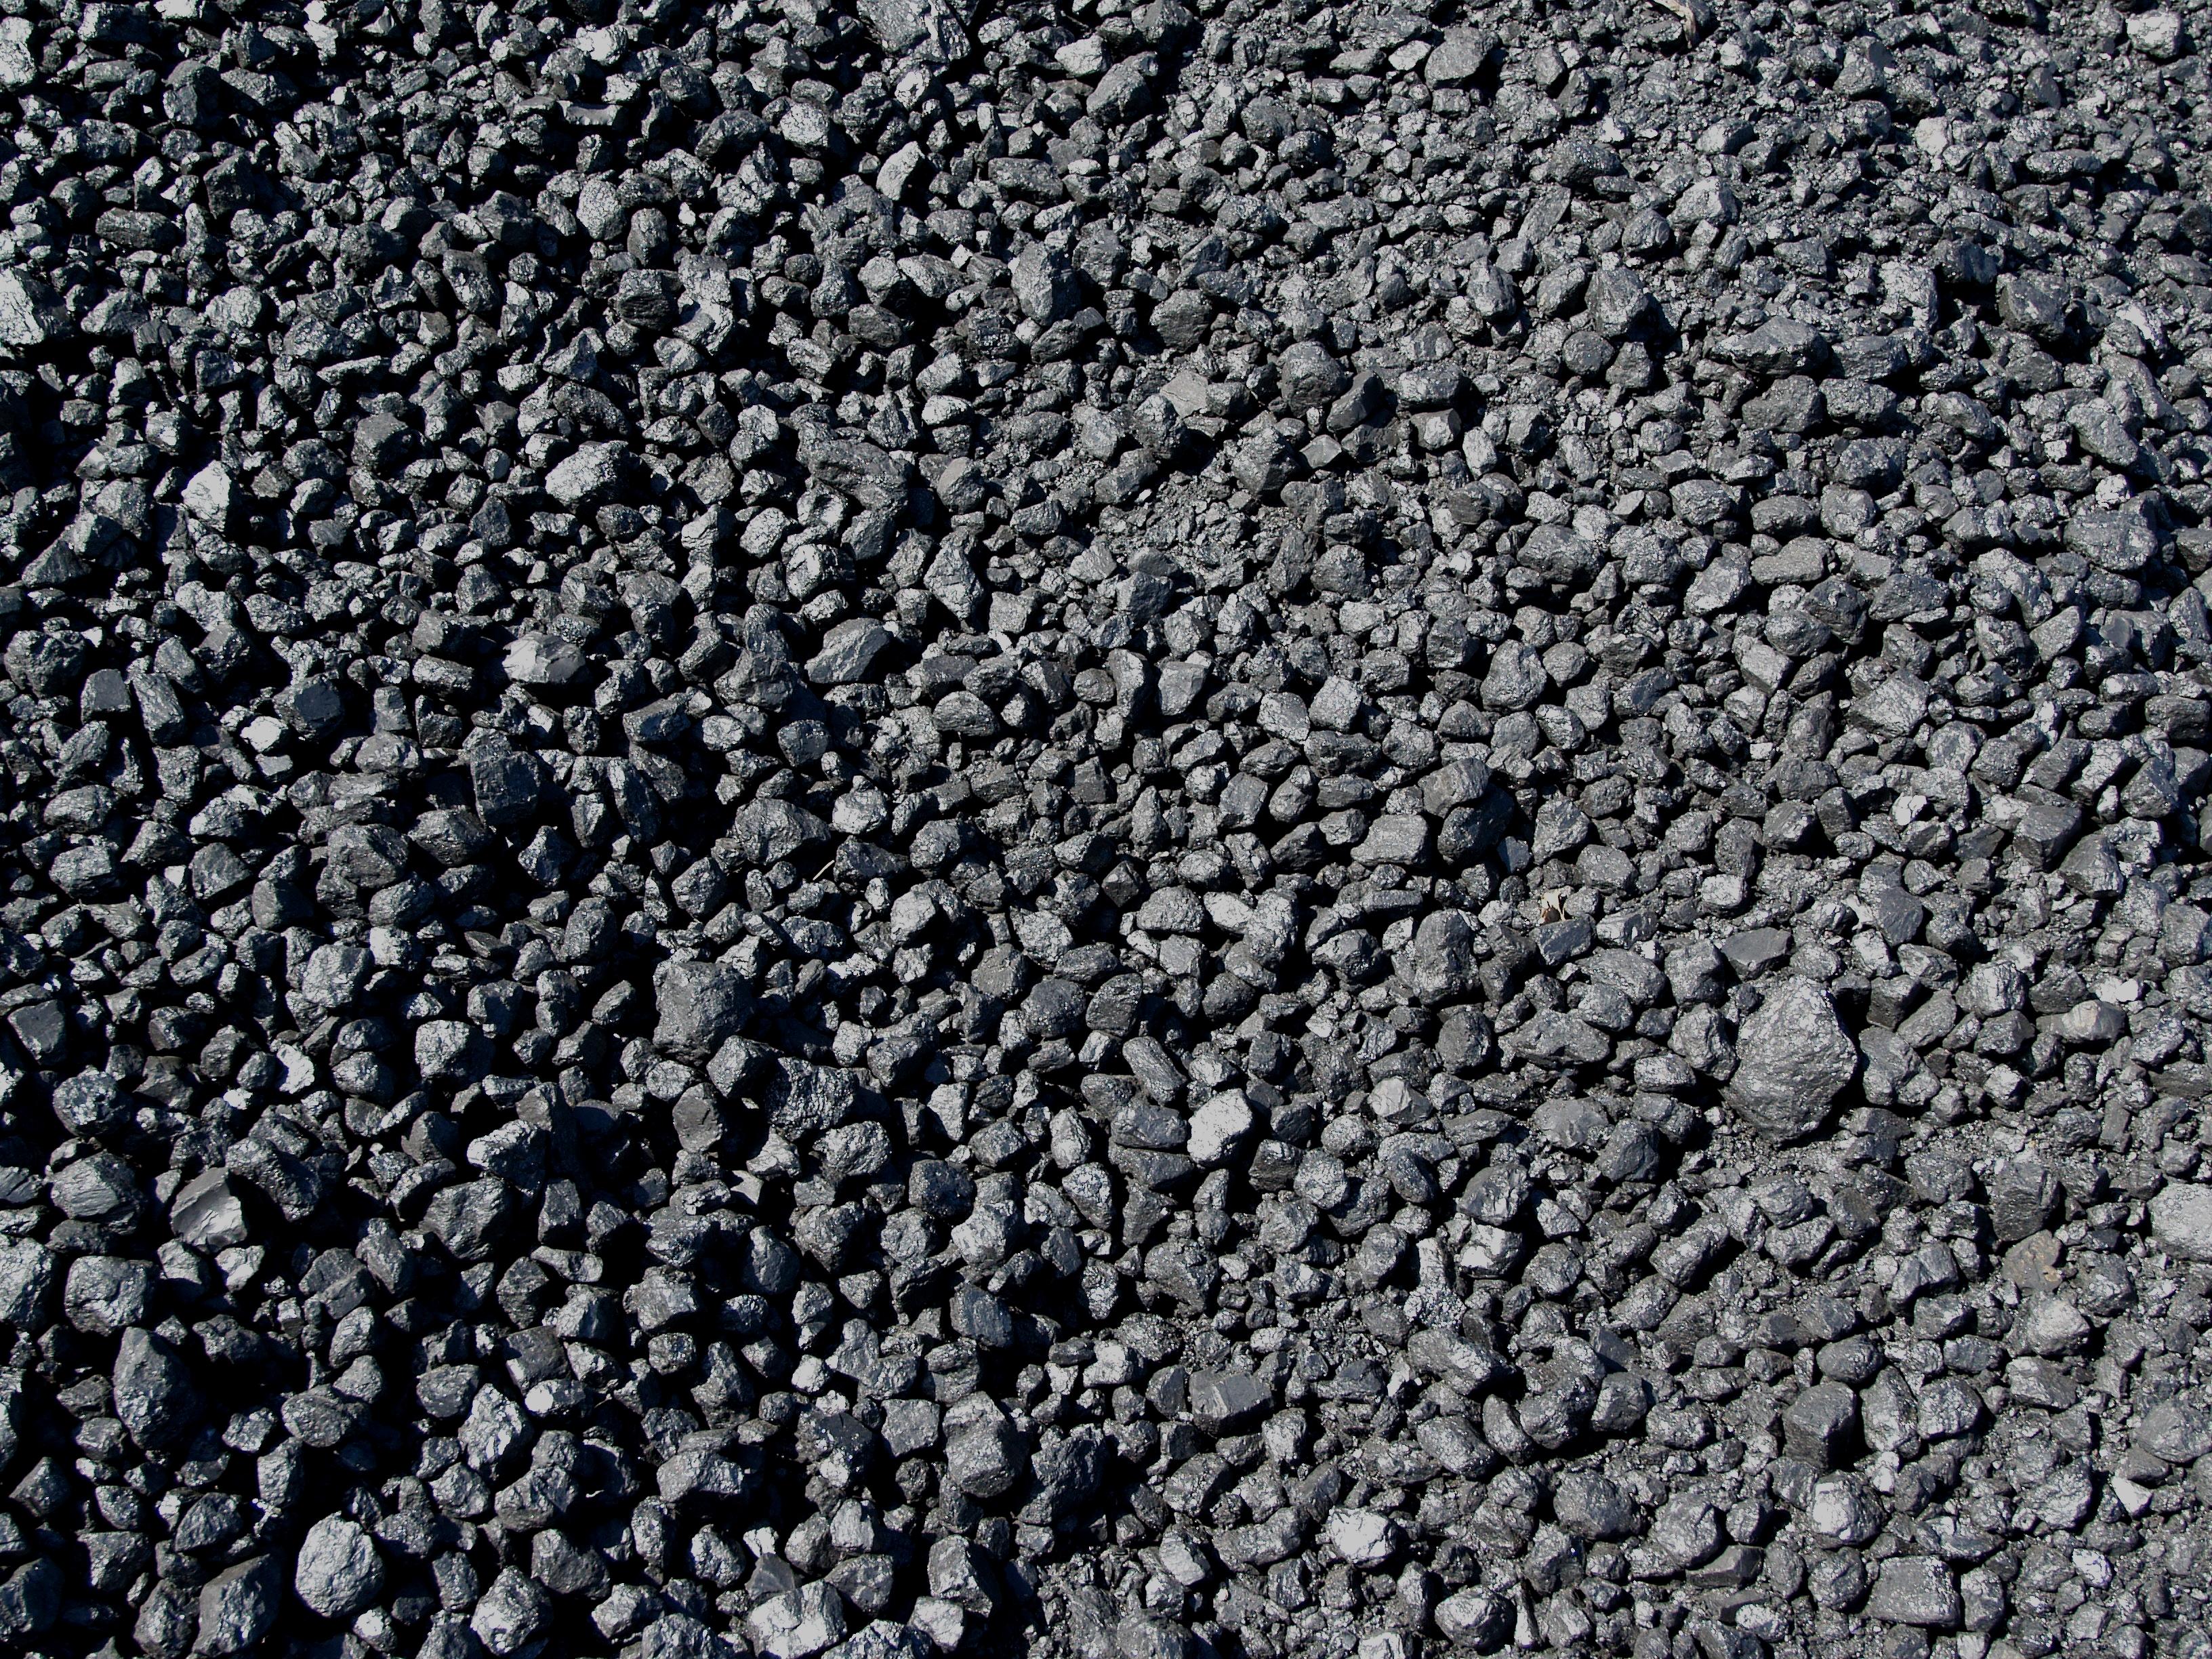 North Carolina Coal Ash Spill Duke Energy February 2014